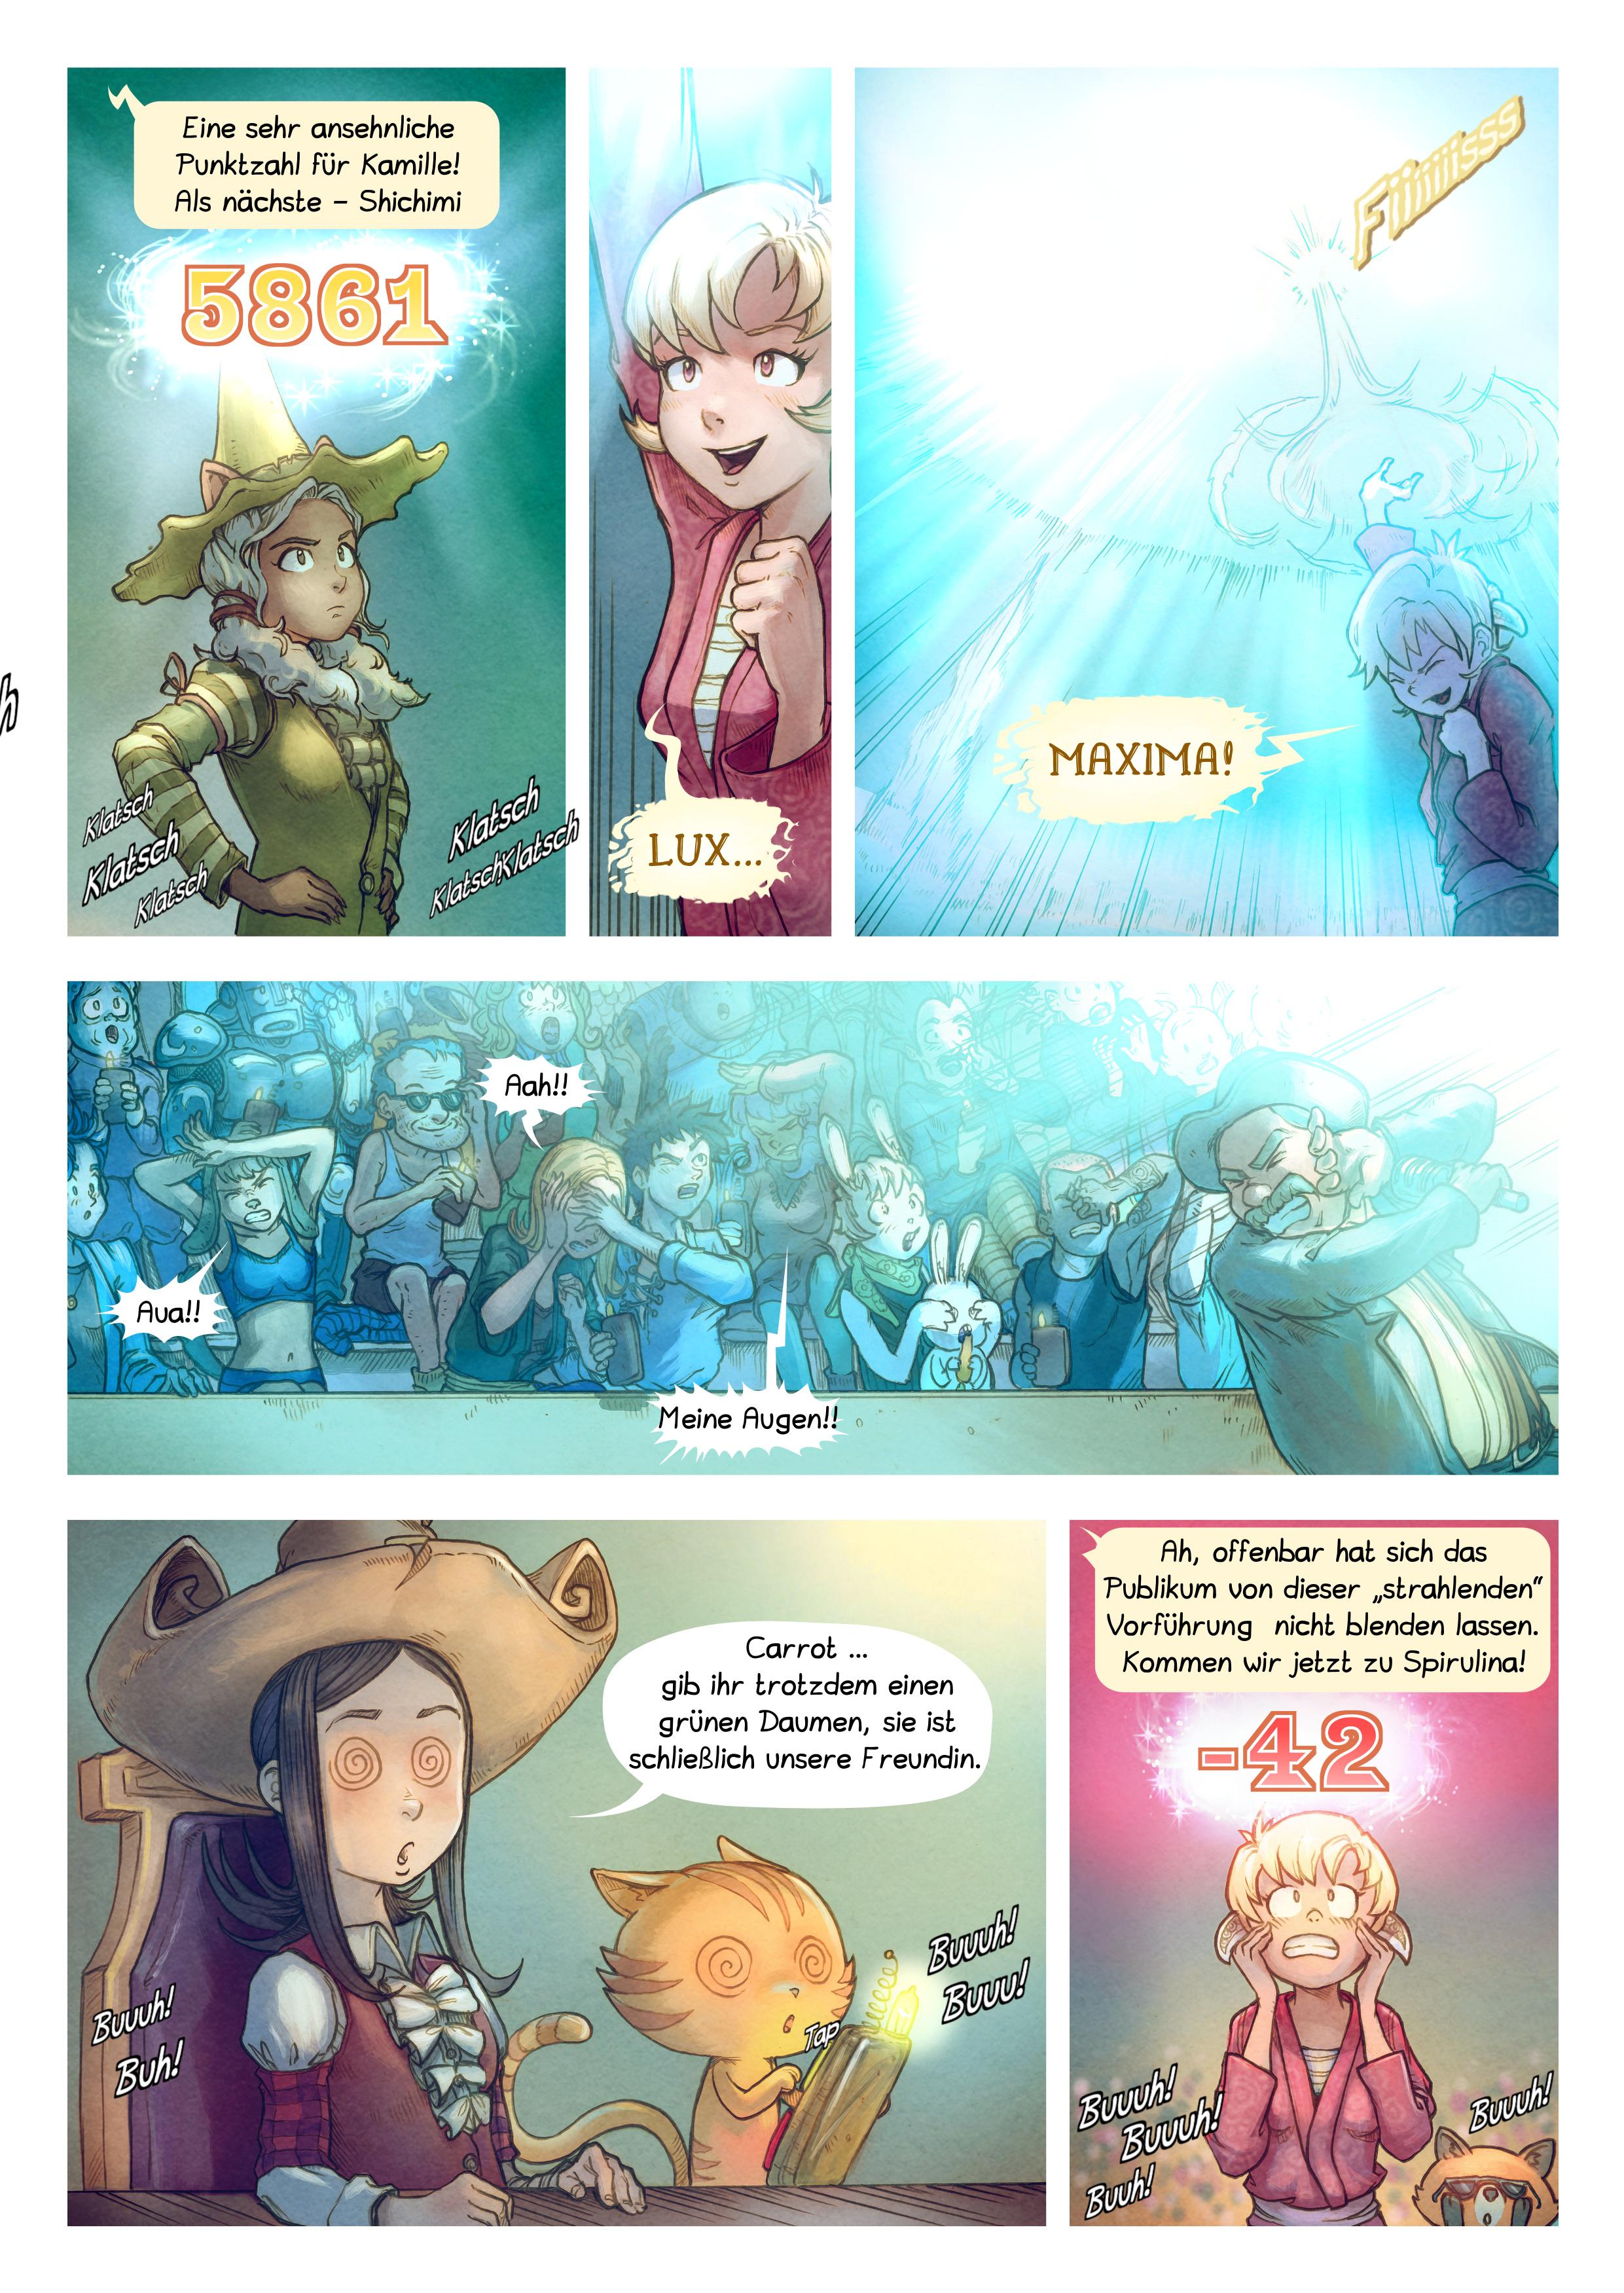 A webcomic page of Pepper&Carrot, Episode 22 [de], Seite 6